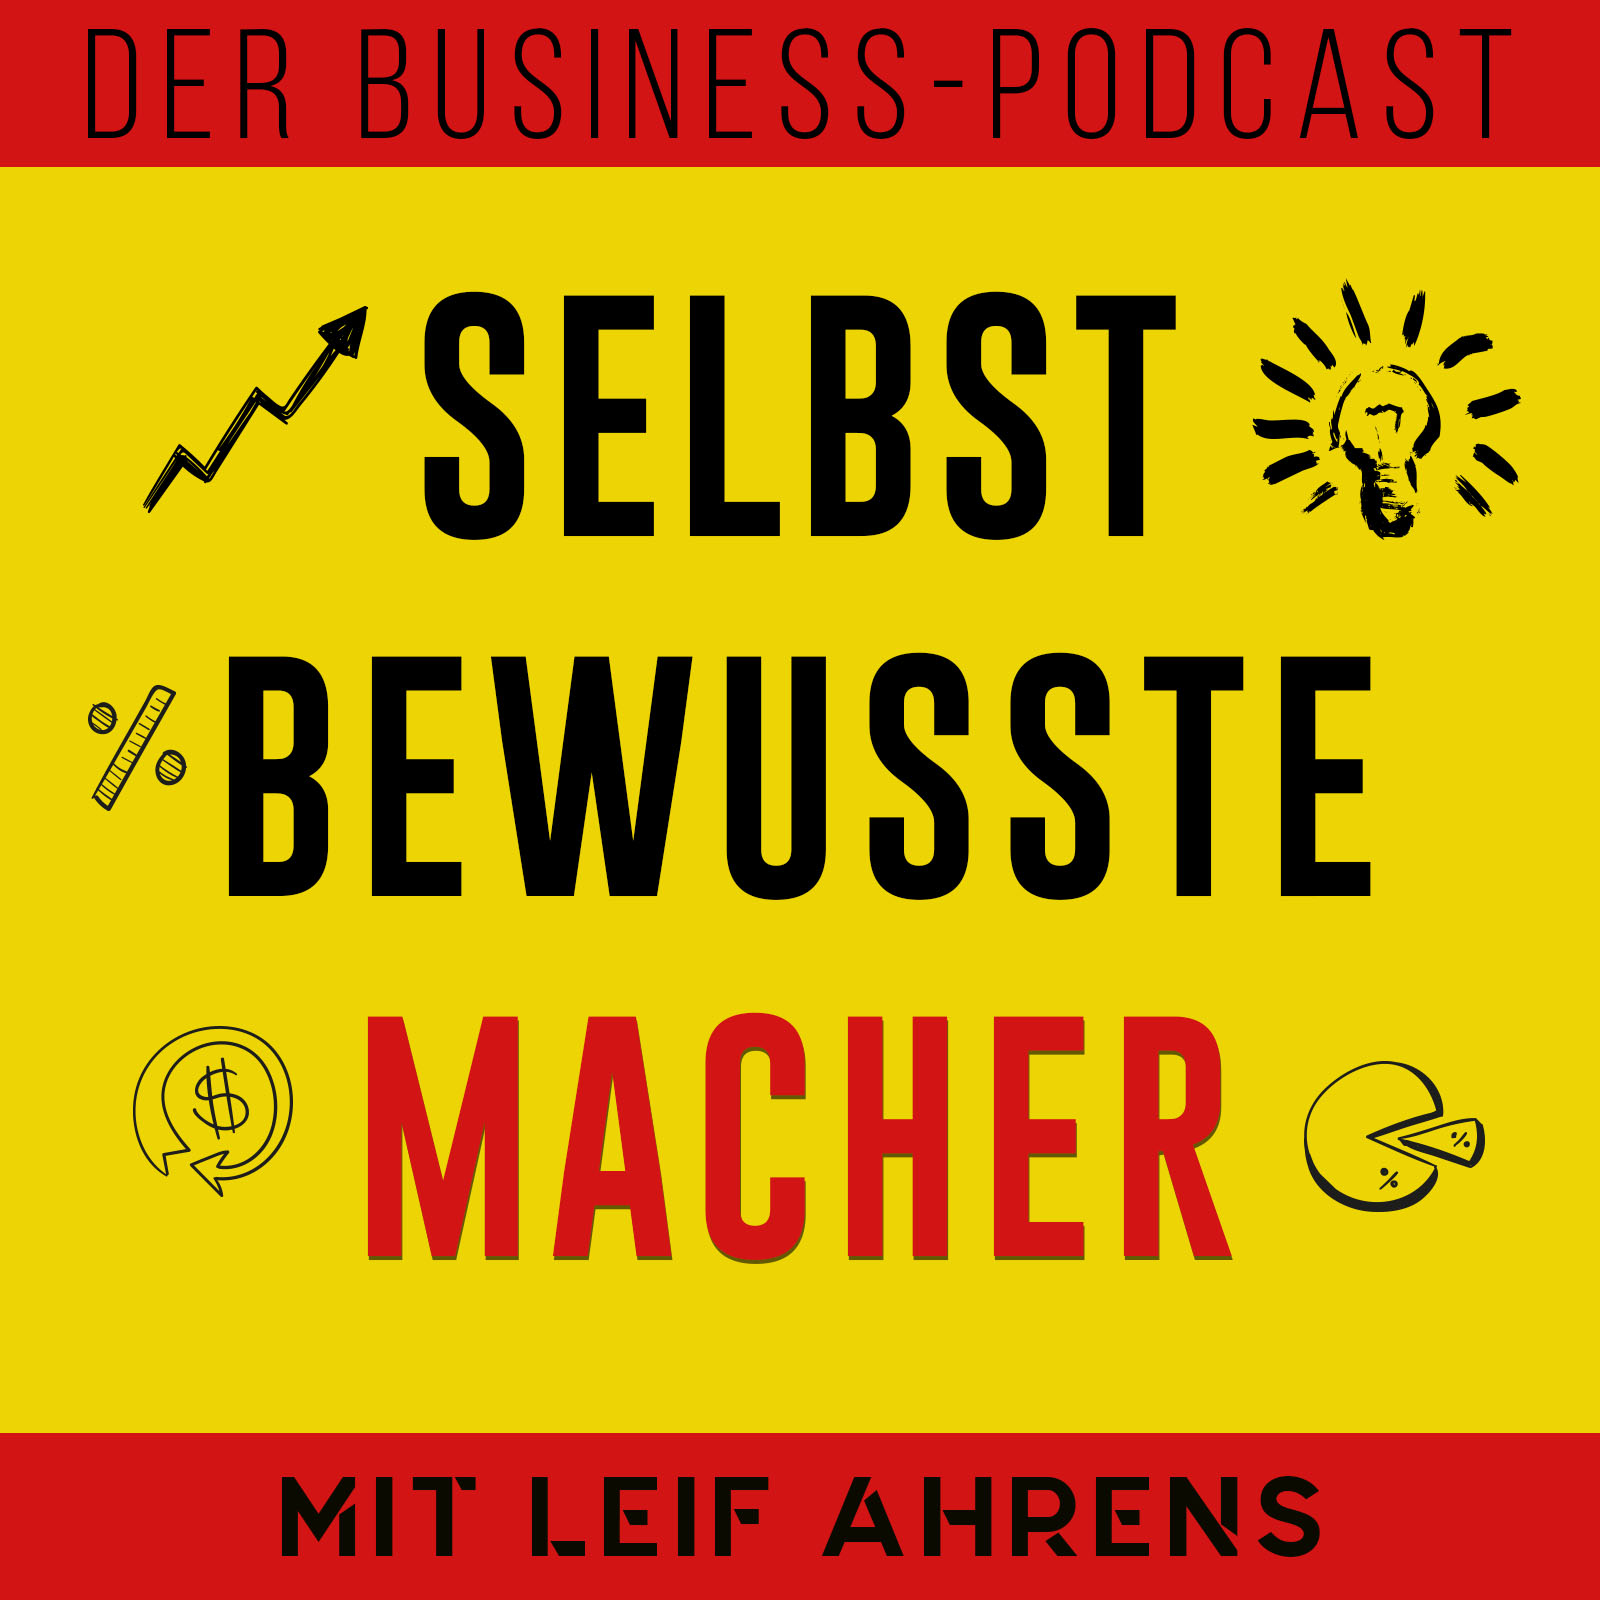 Artwork for podcast Selbstbewusste Macher